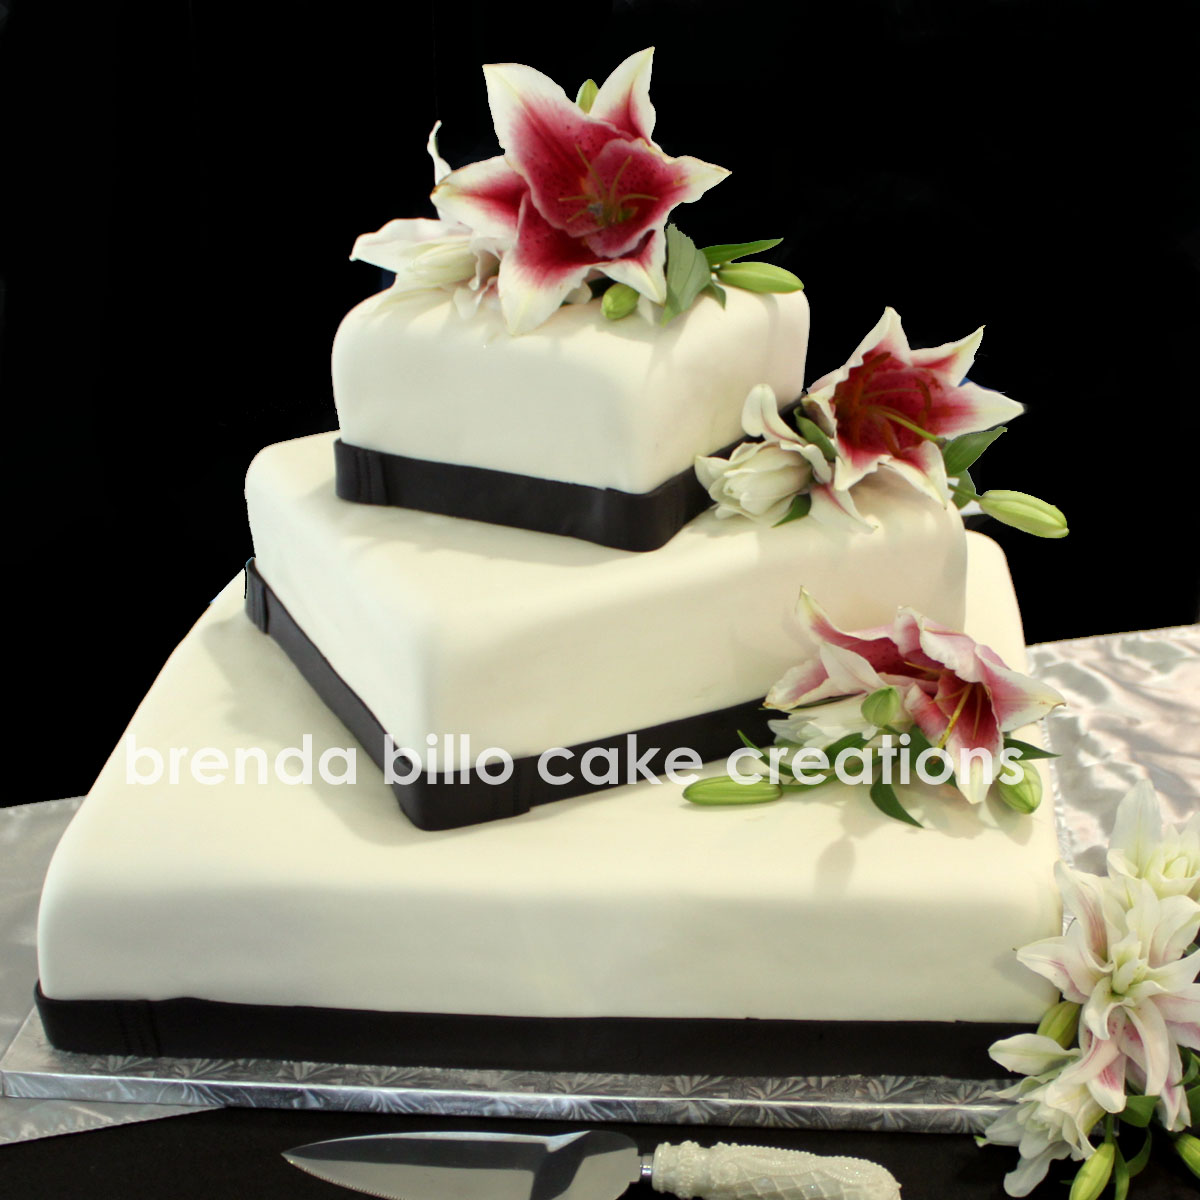 Brenda Billo Cake Creations pink lily square